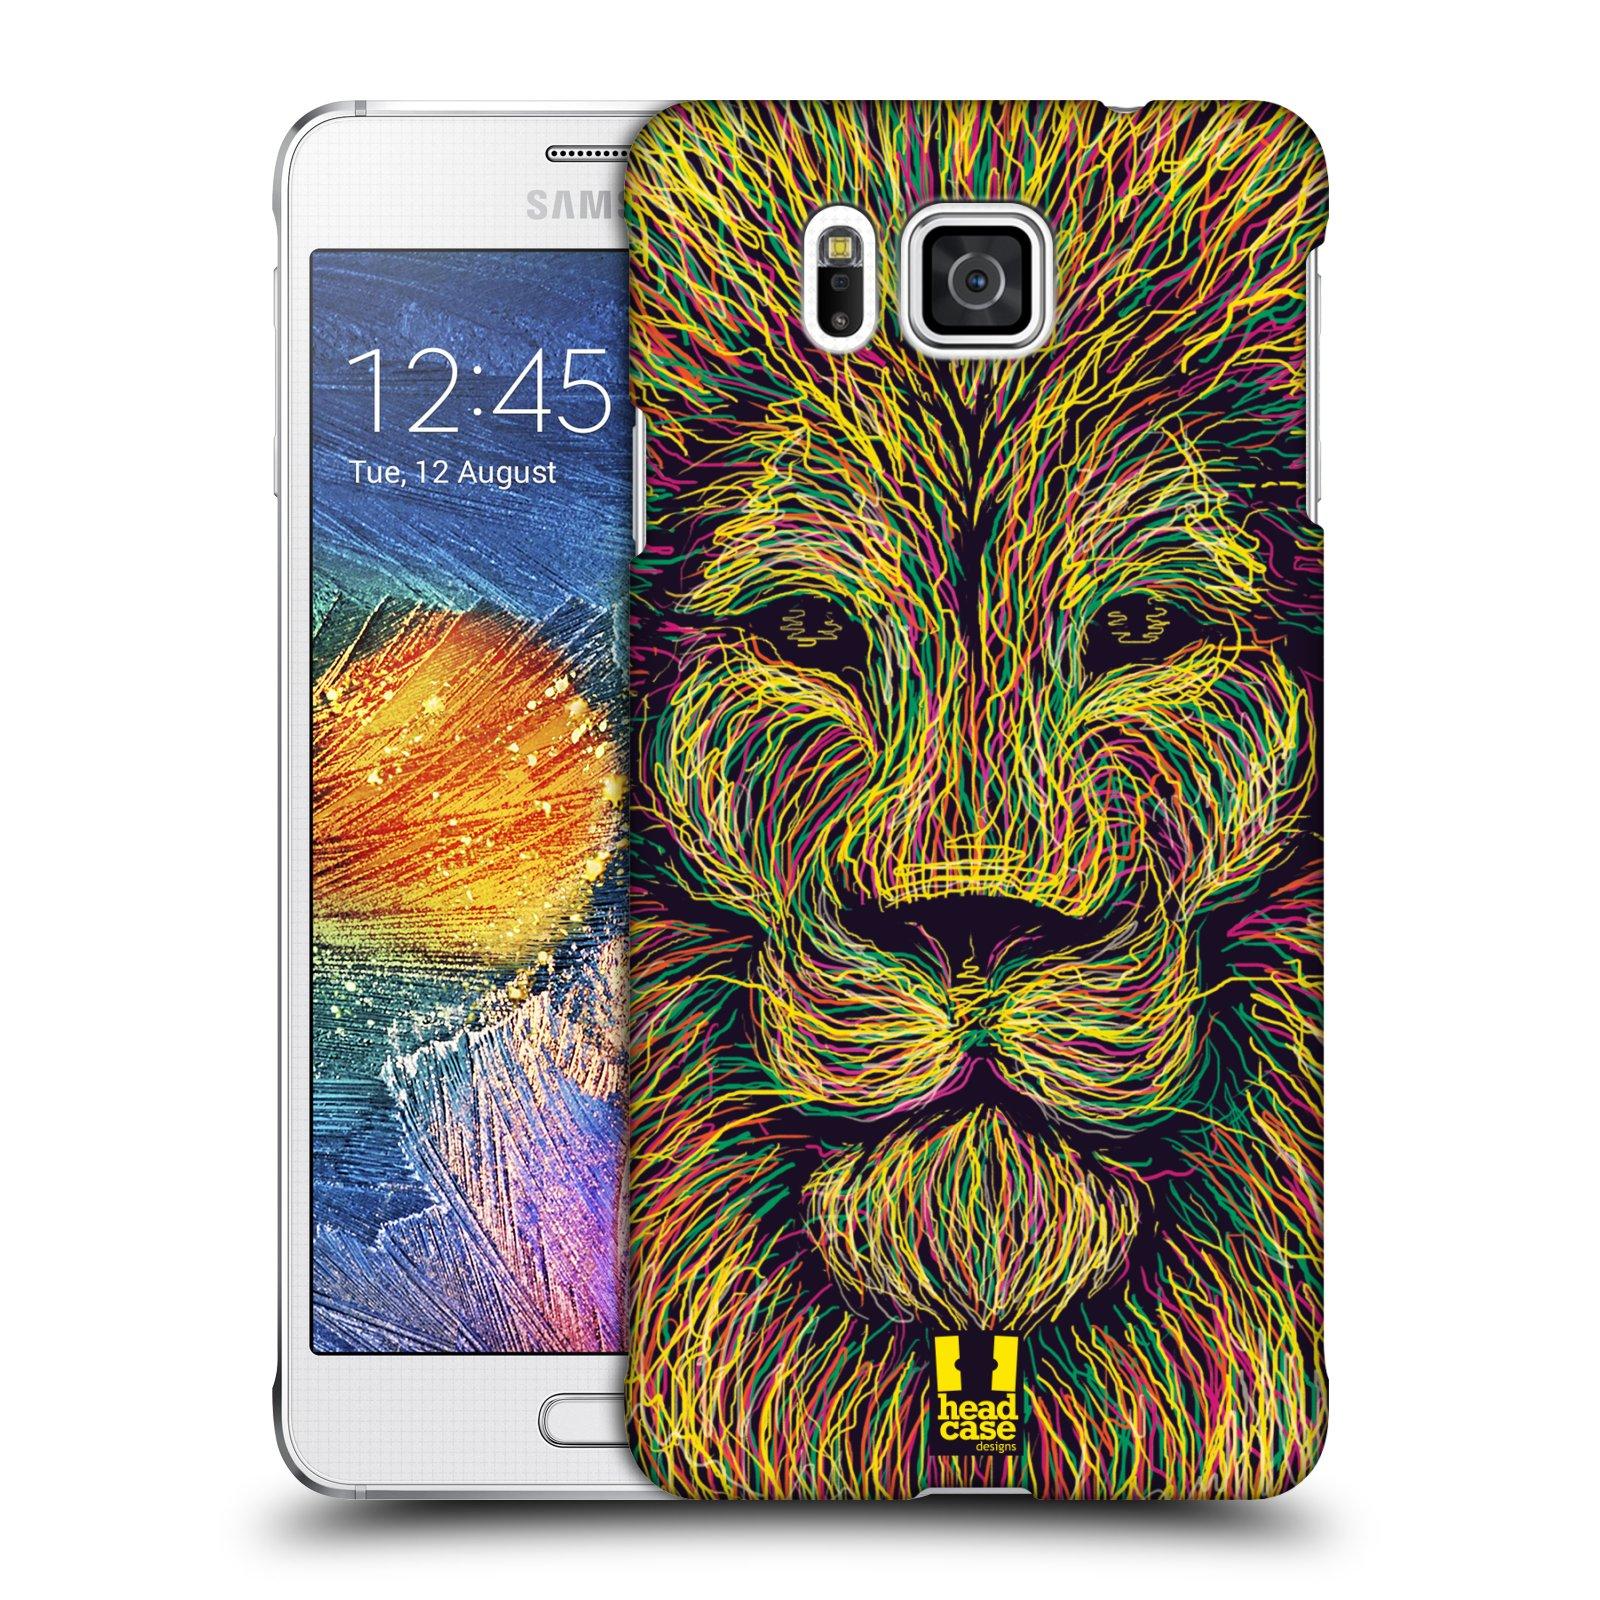 HEAD CASE plastový obal na mobil SAMSUNG Galaxy Alpha (G850) vzor zvíře čmáranice lev